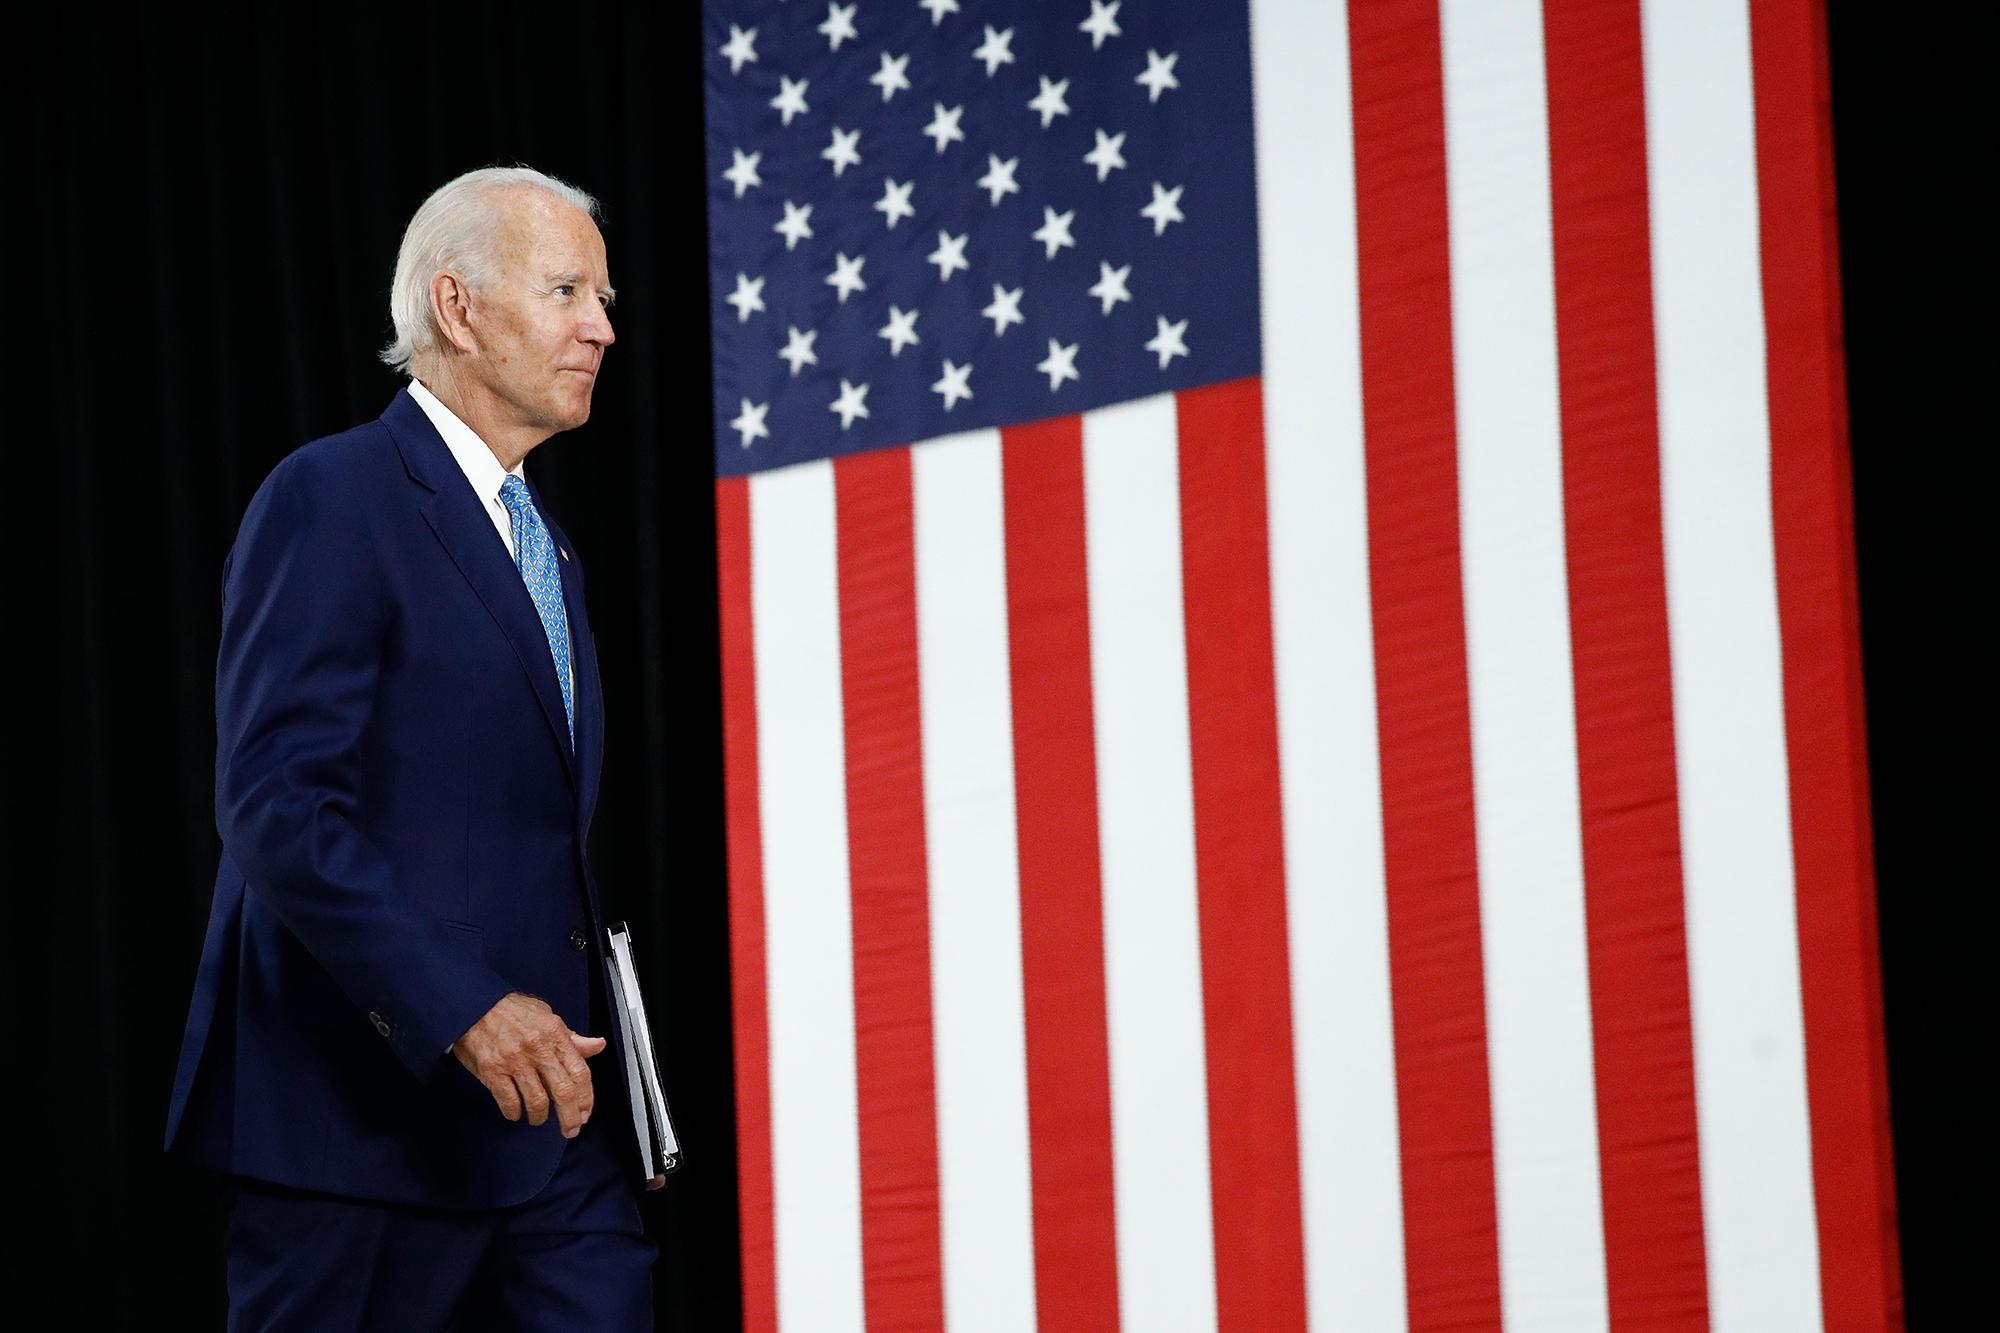 Trump warns stocks will 'disintegrate' if he loses. But stocks are climbing as Biden pulls ahead